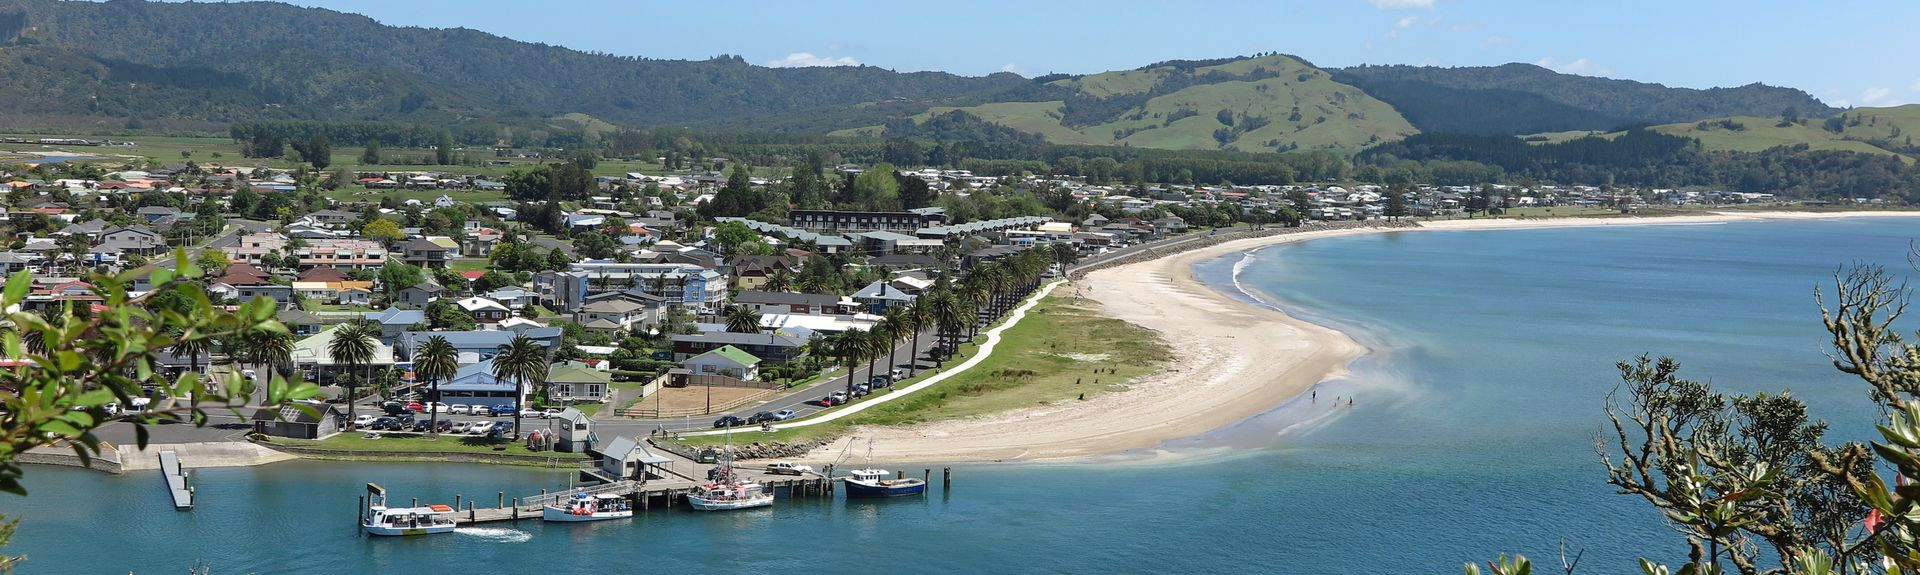 Whitianga, Thames-Coromandel, Waikato, New Zealand